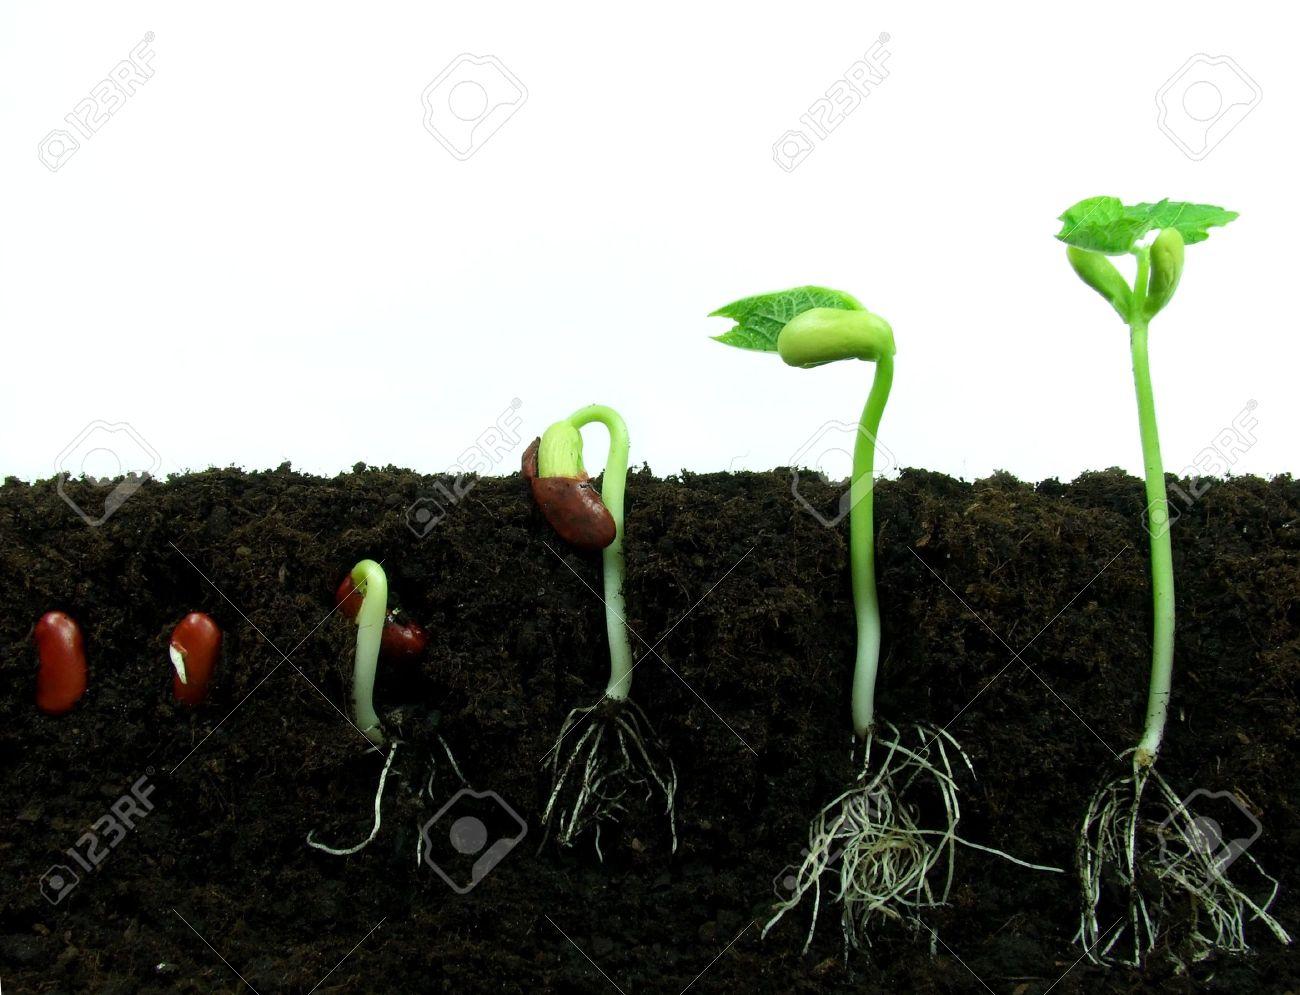 Bean seeds germinating in soil Stock Photo - 15023222